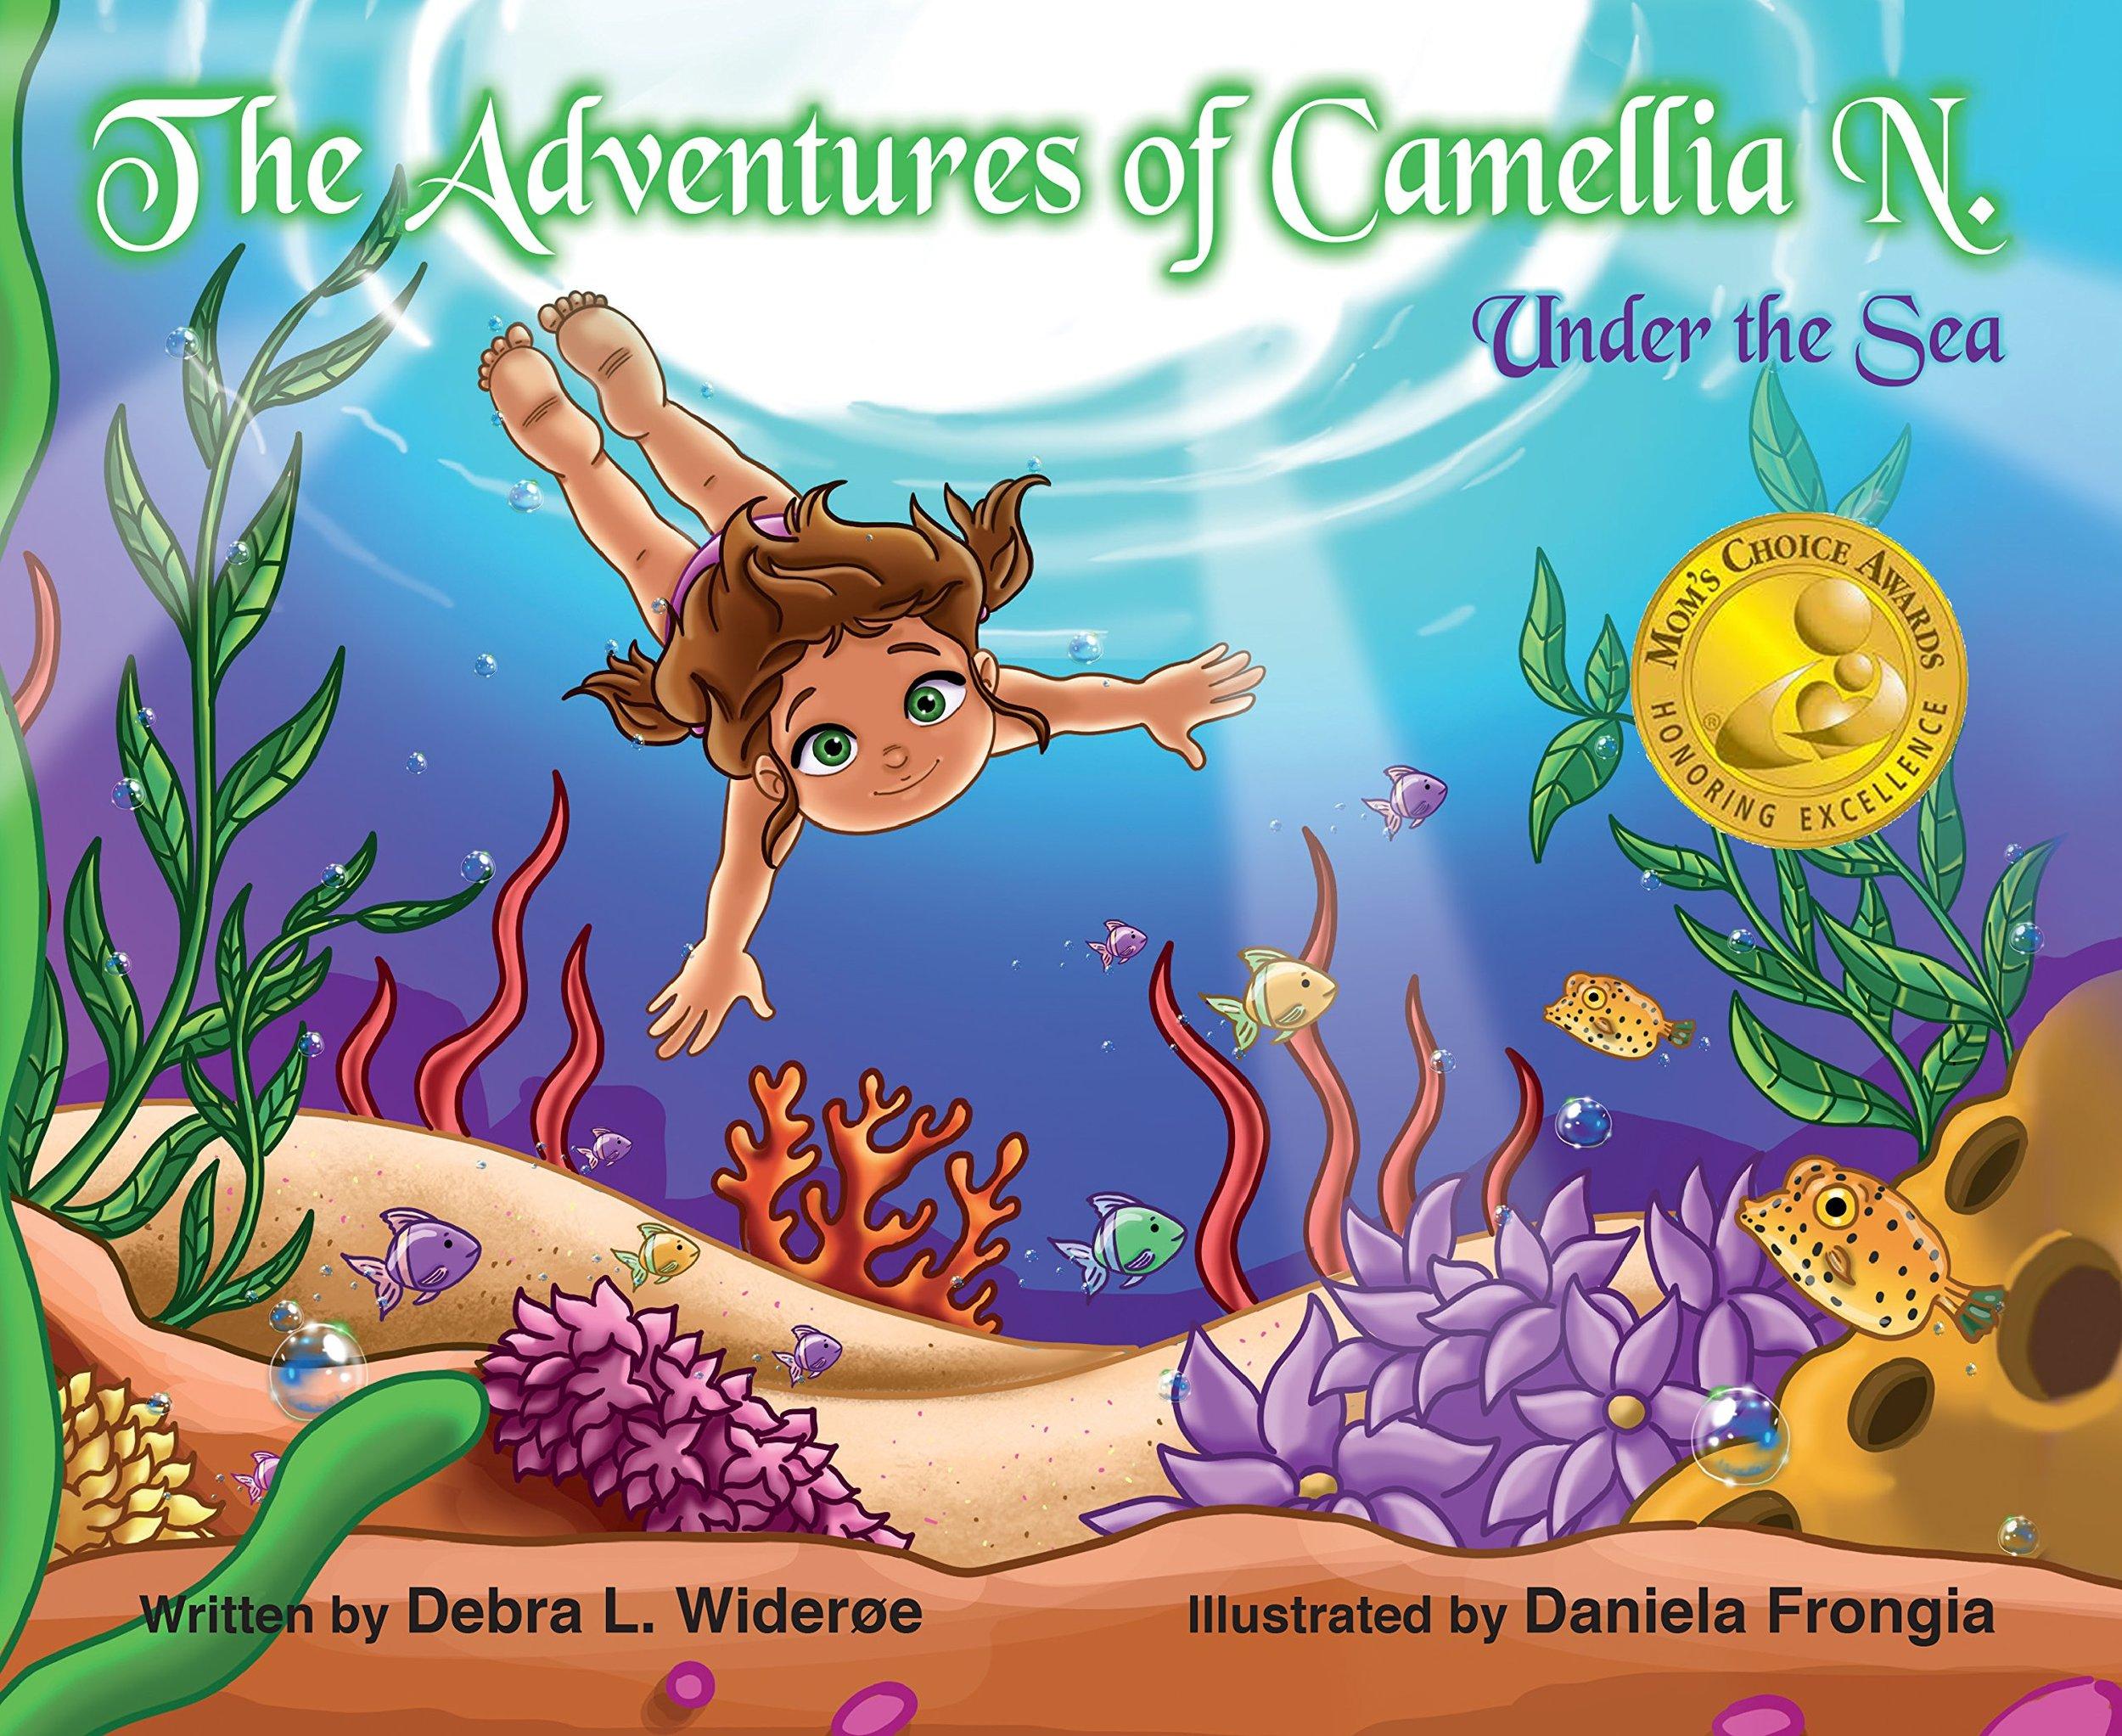 7b3ba275eb2 The Adventures of Camellia N. Under the Sea.jpg